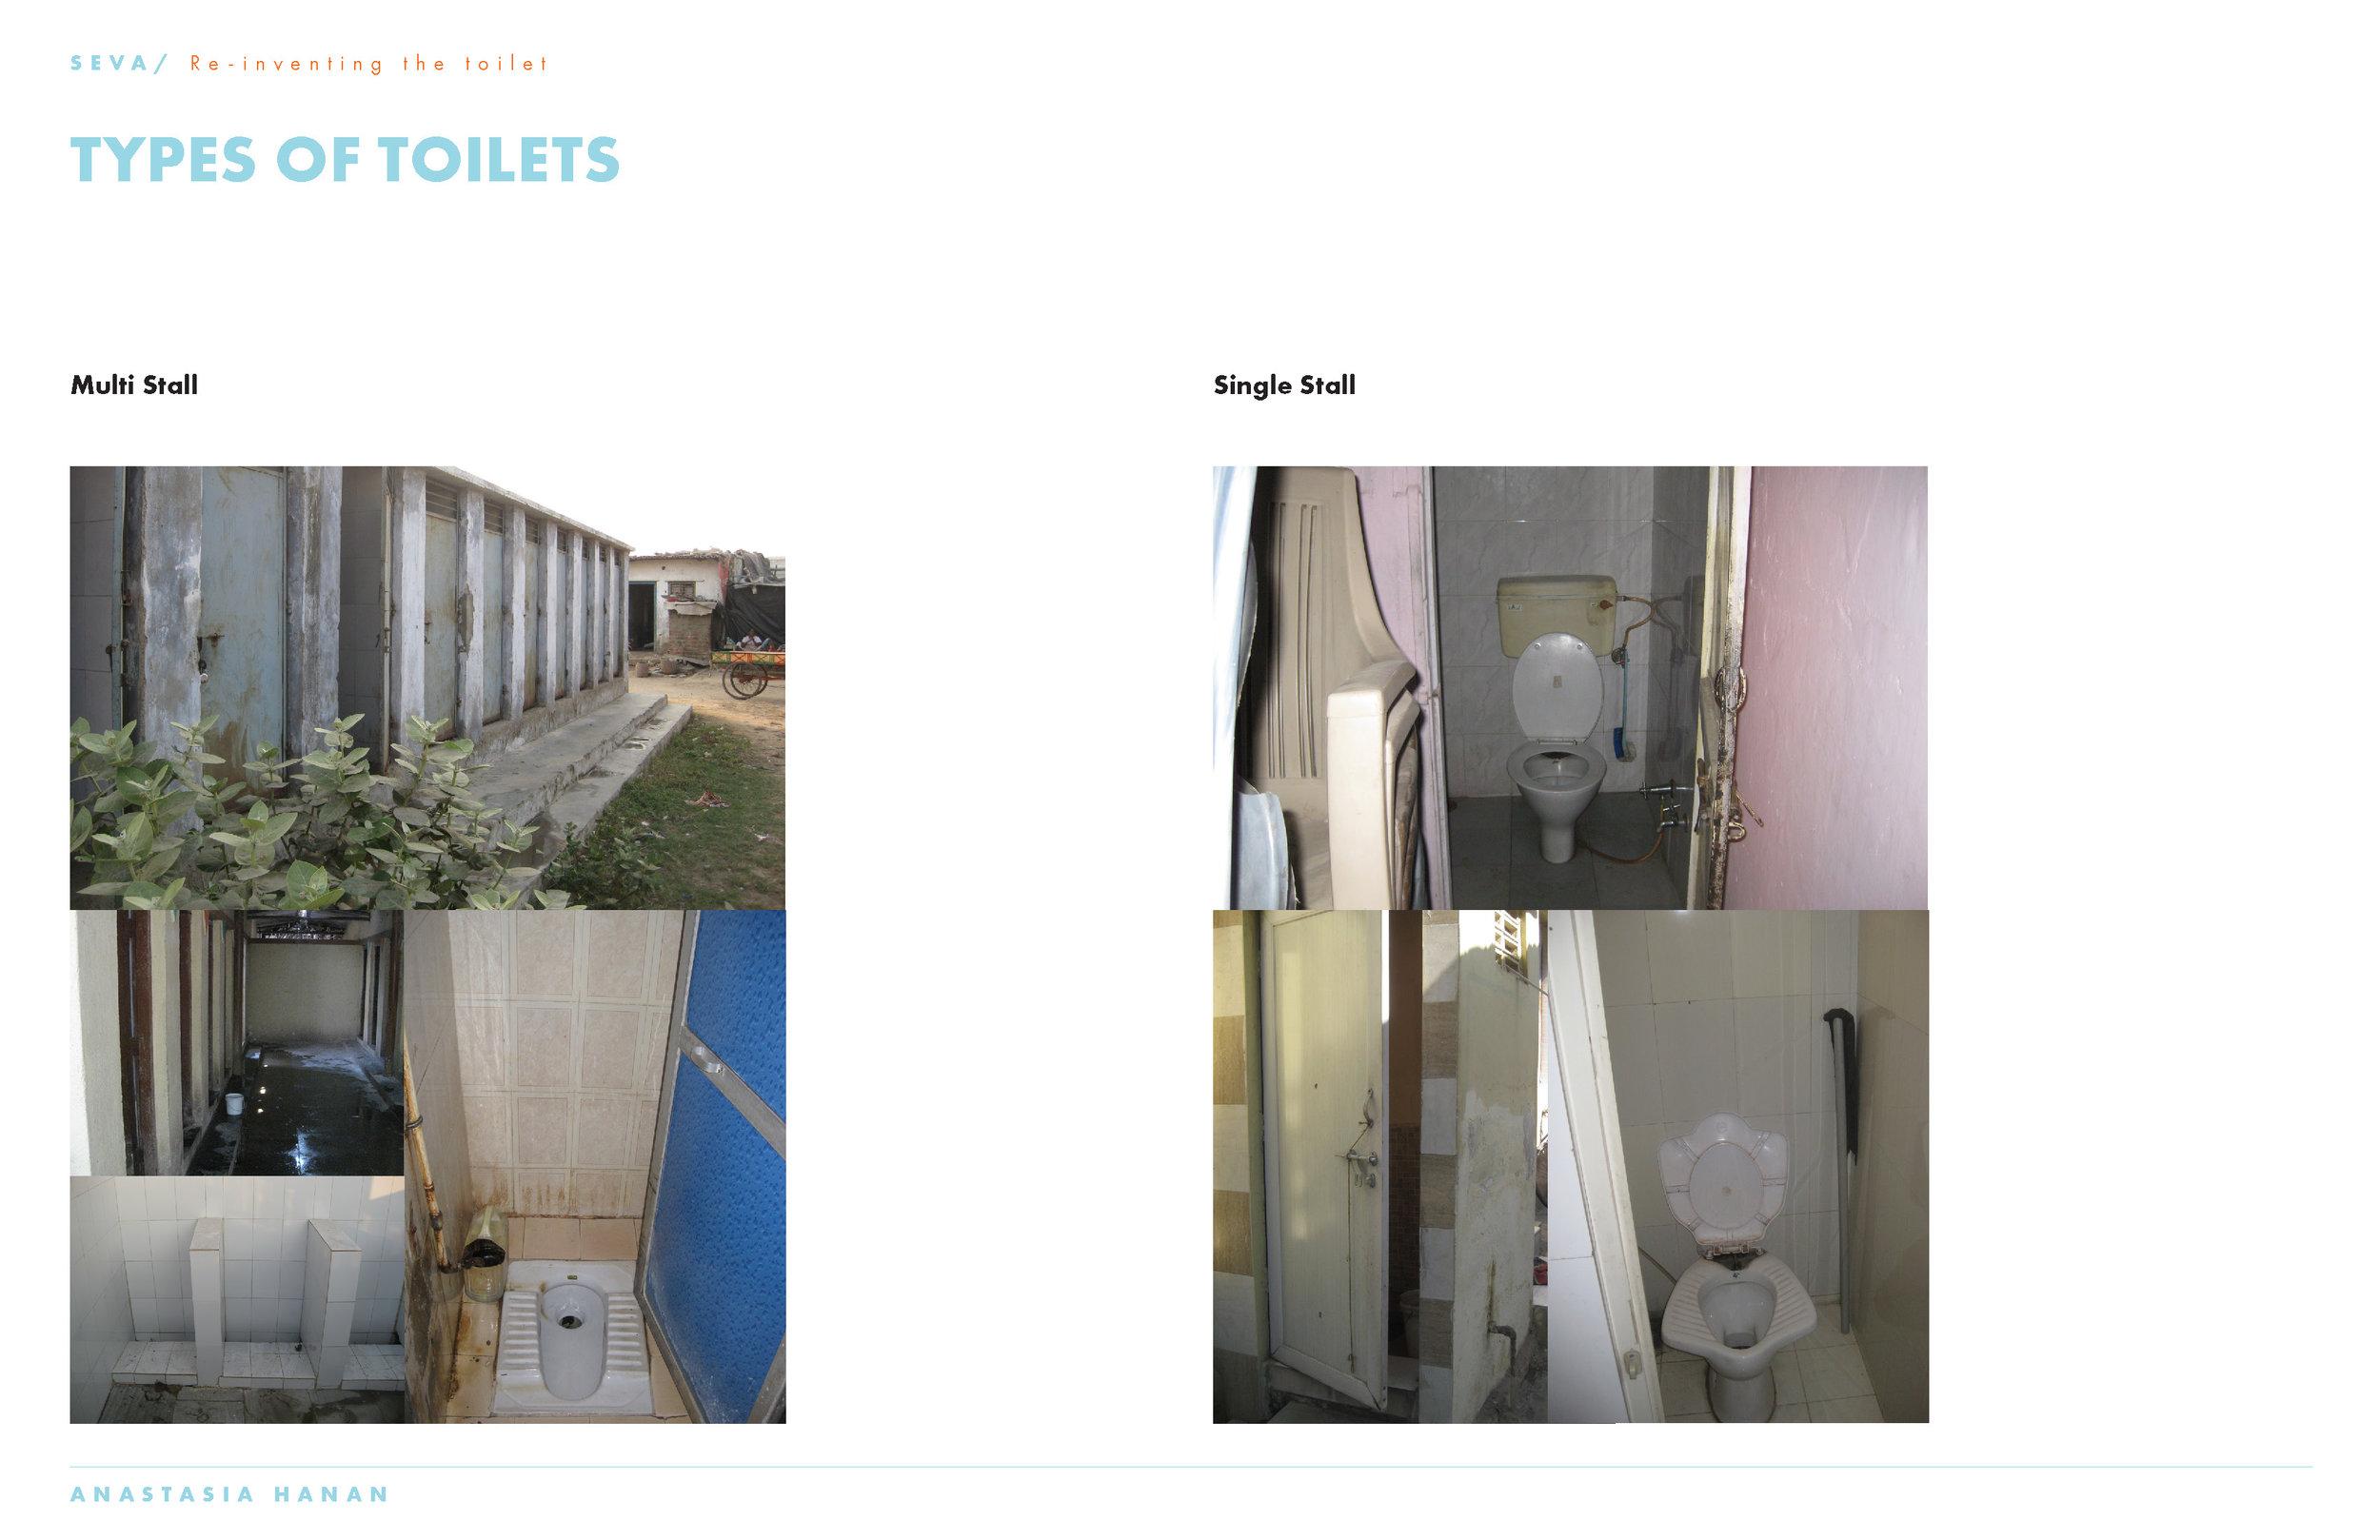 SEVA_toilets_processfinalV2_Page_52.jpg